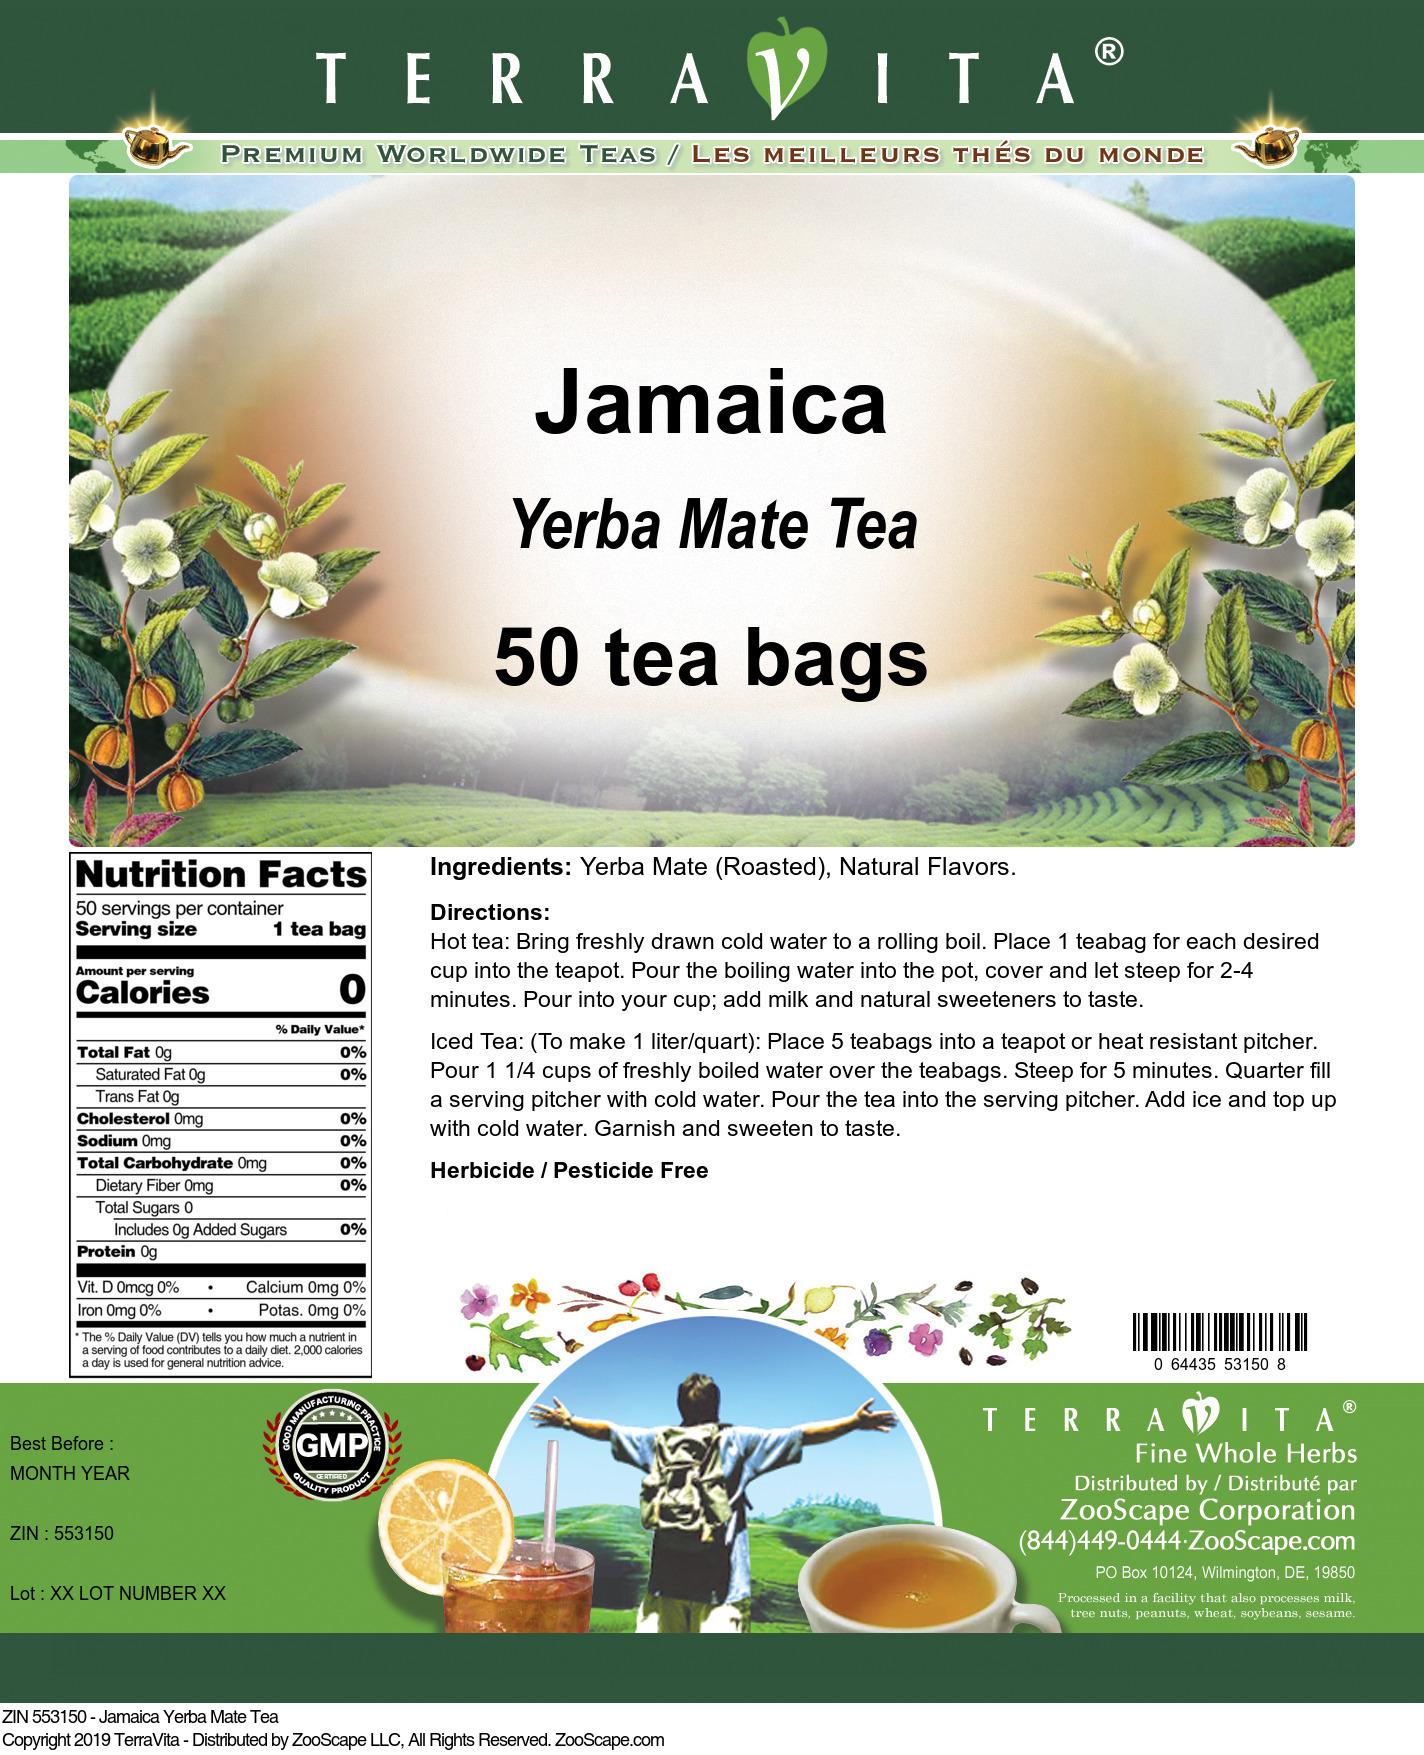 Jamaica Yerba Mate Tea